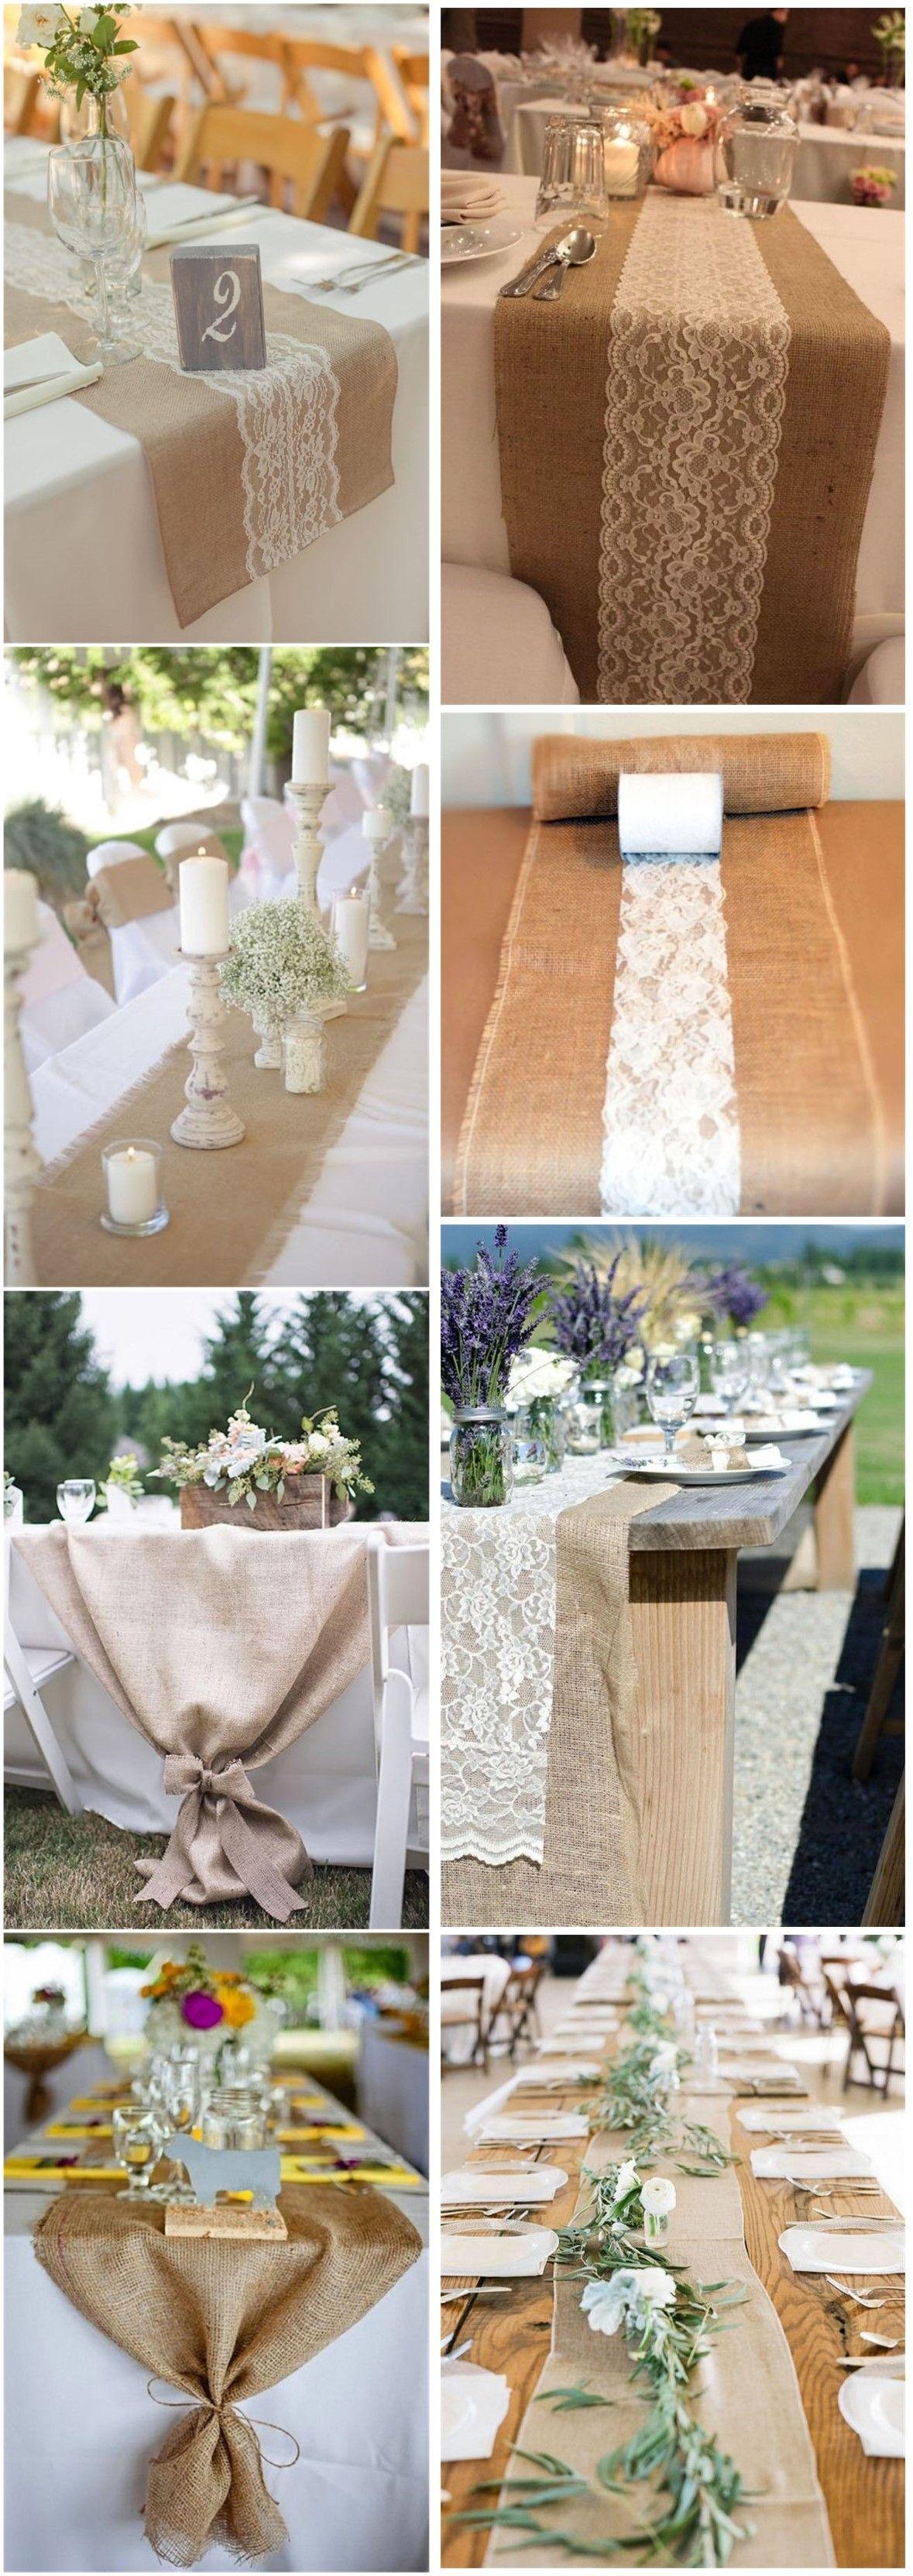 rustic burlap wedding table runner ideas you will love wedding